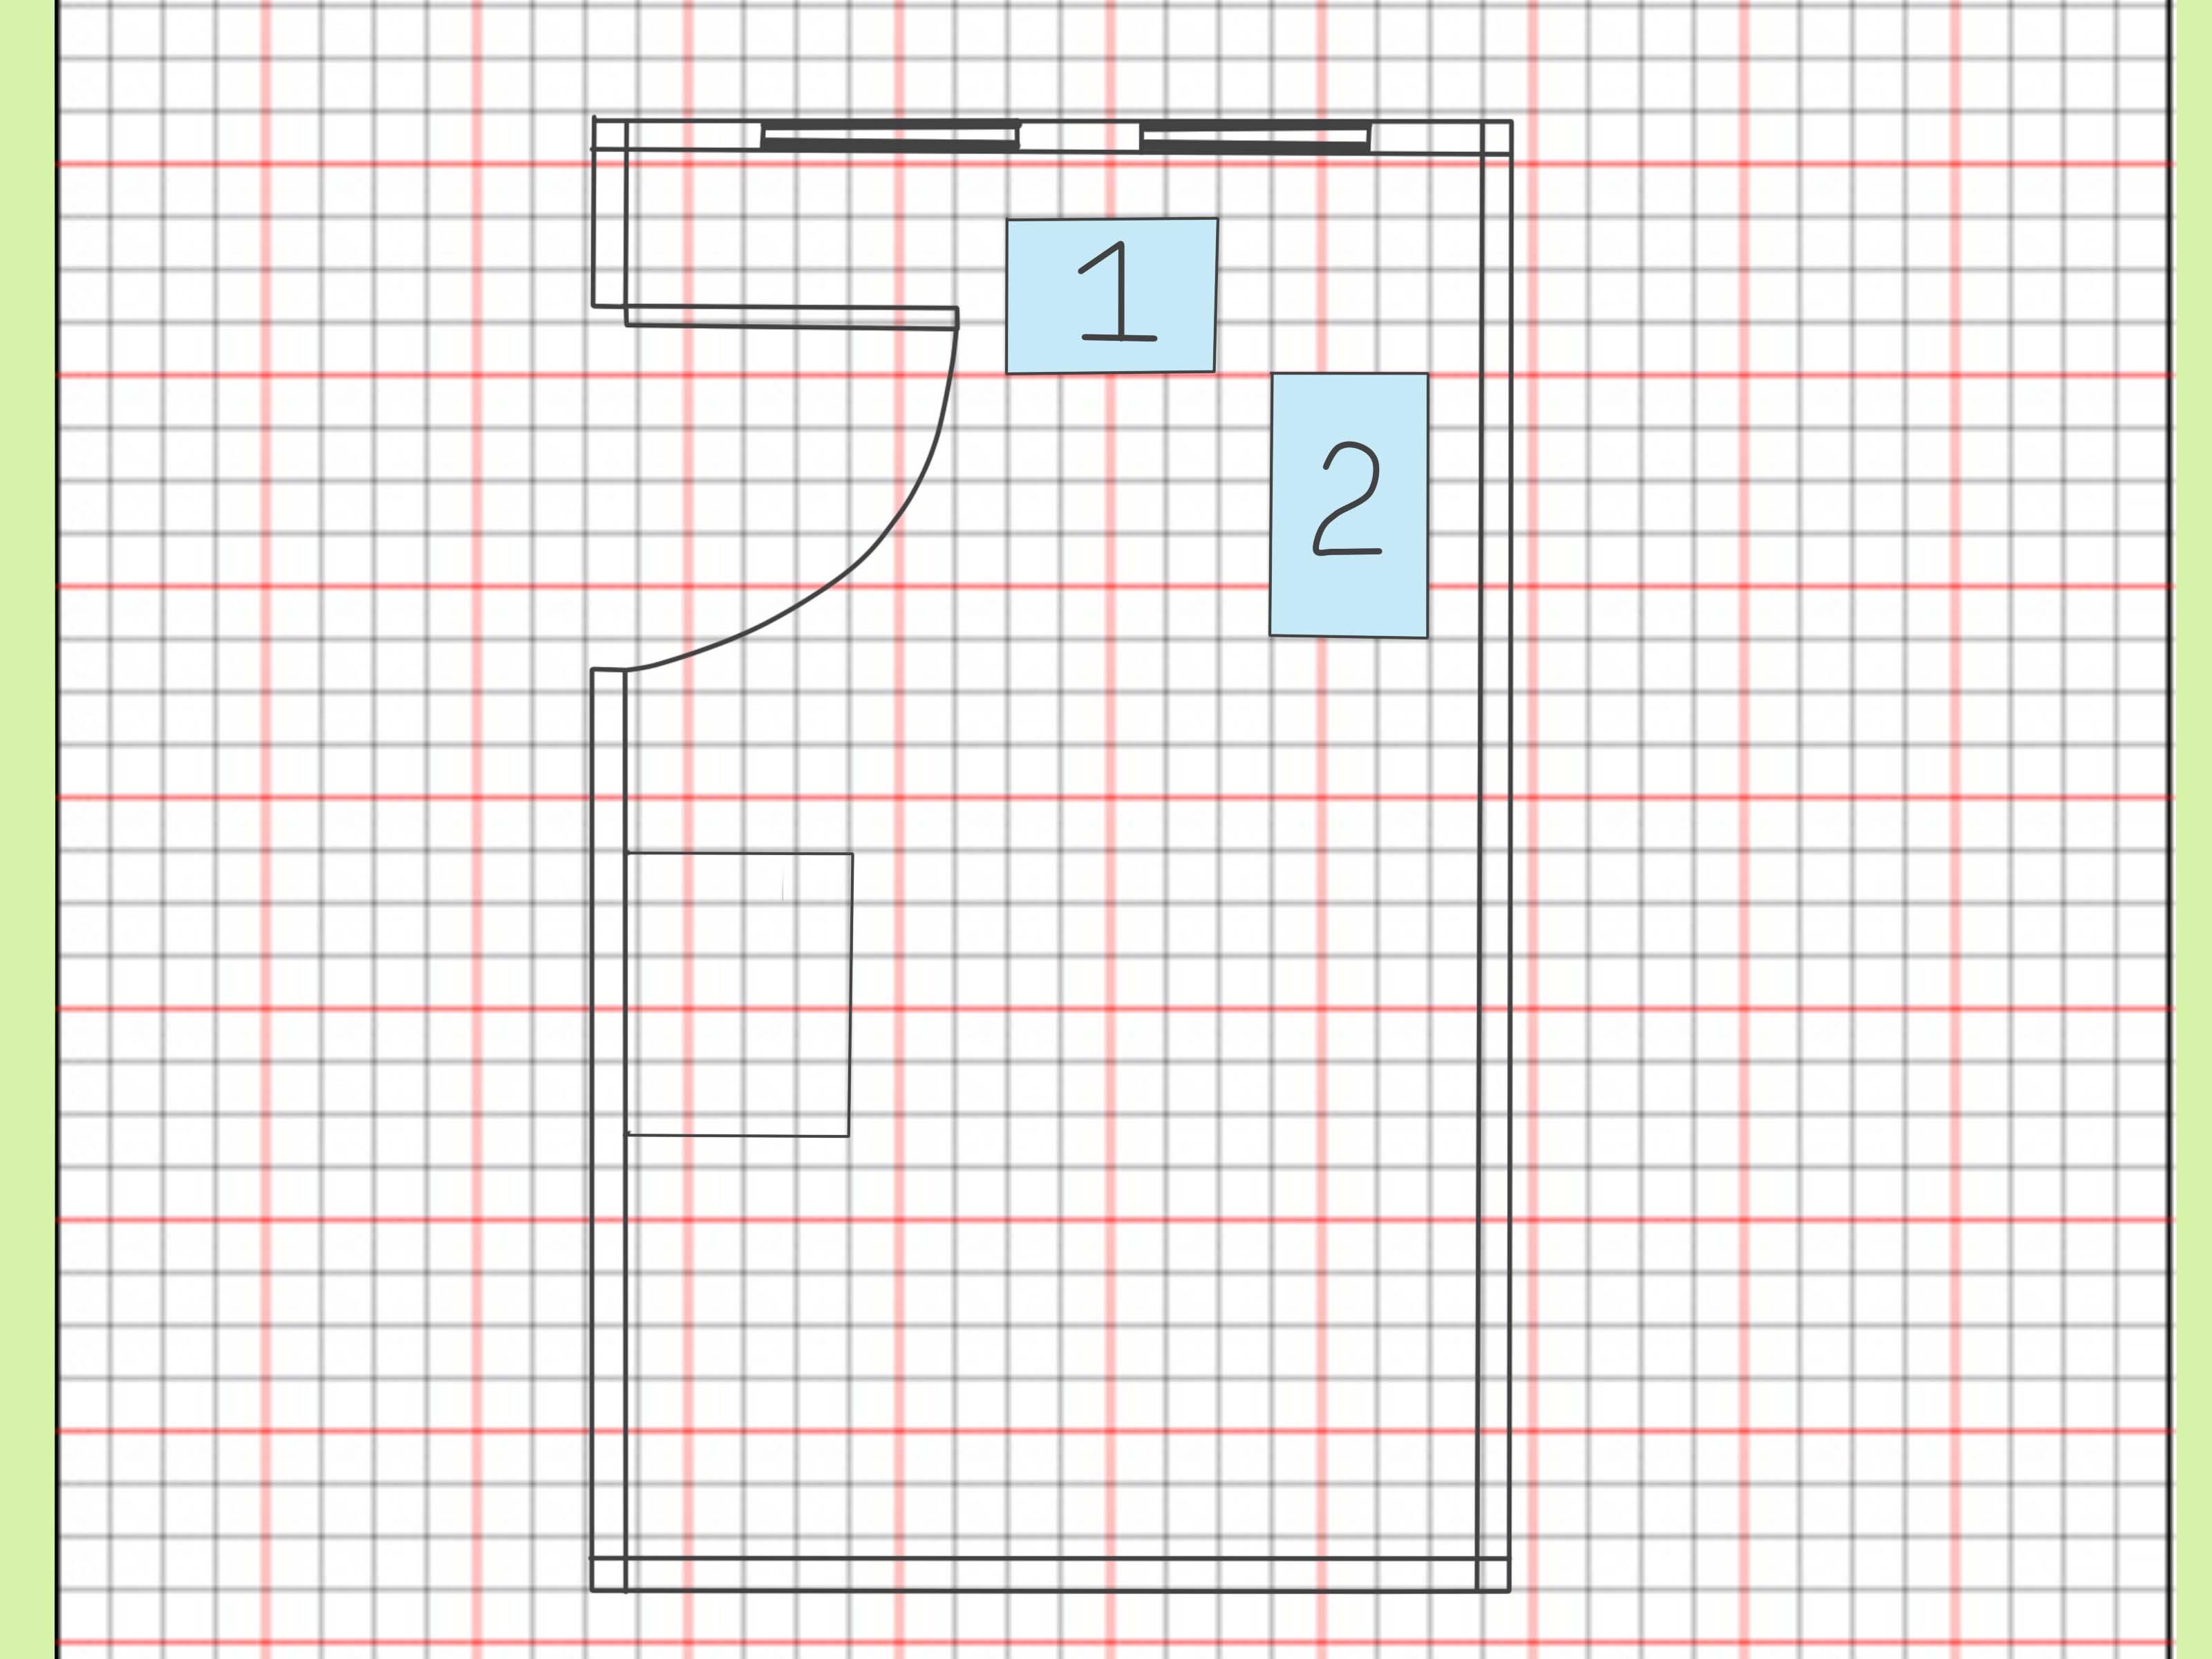 Drawn paper house  Cltsd 1 M 1